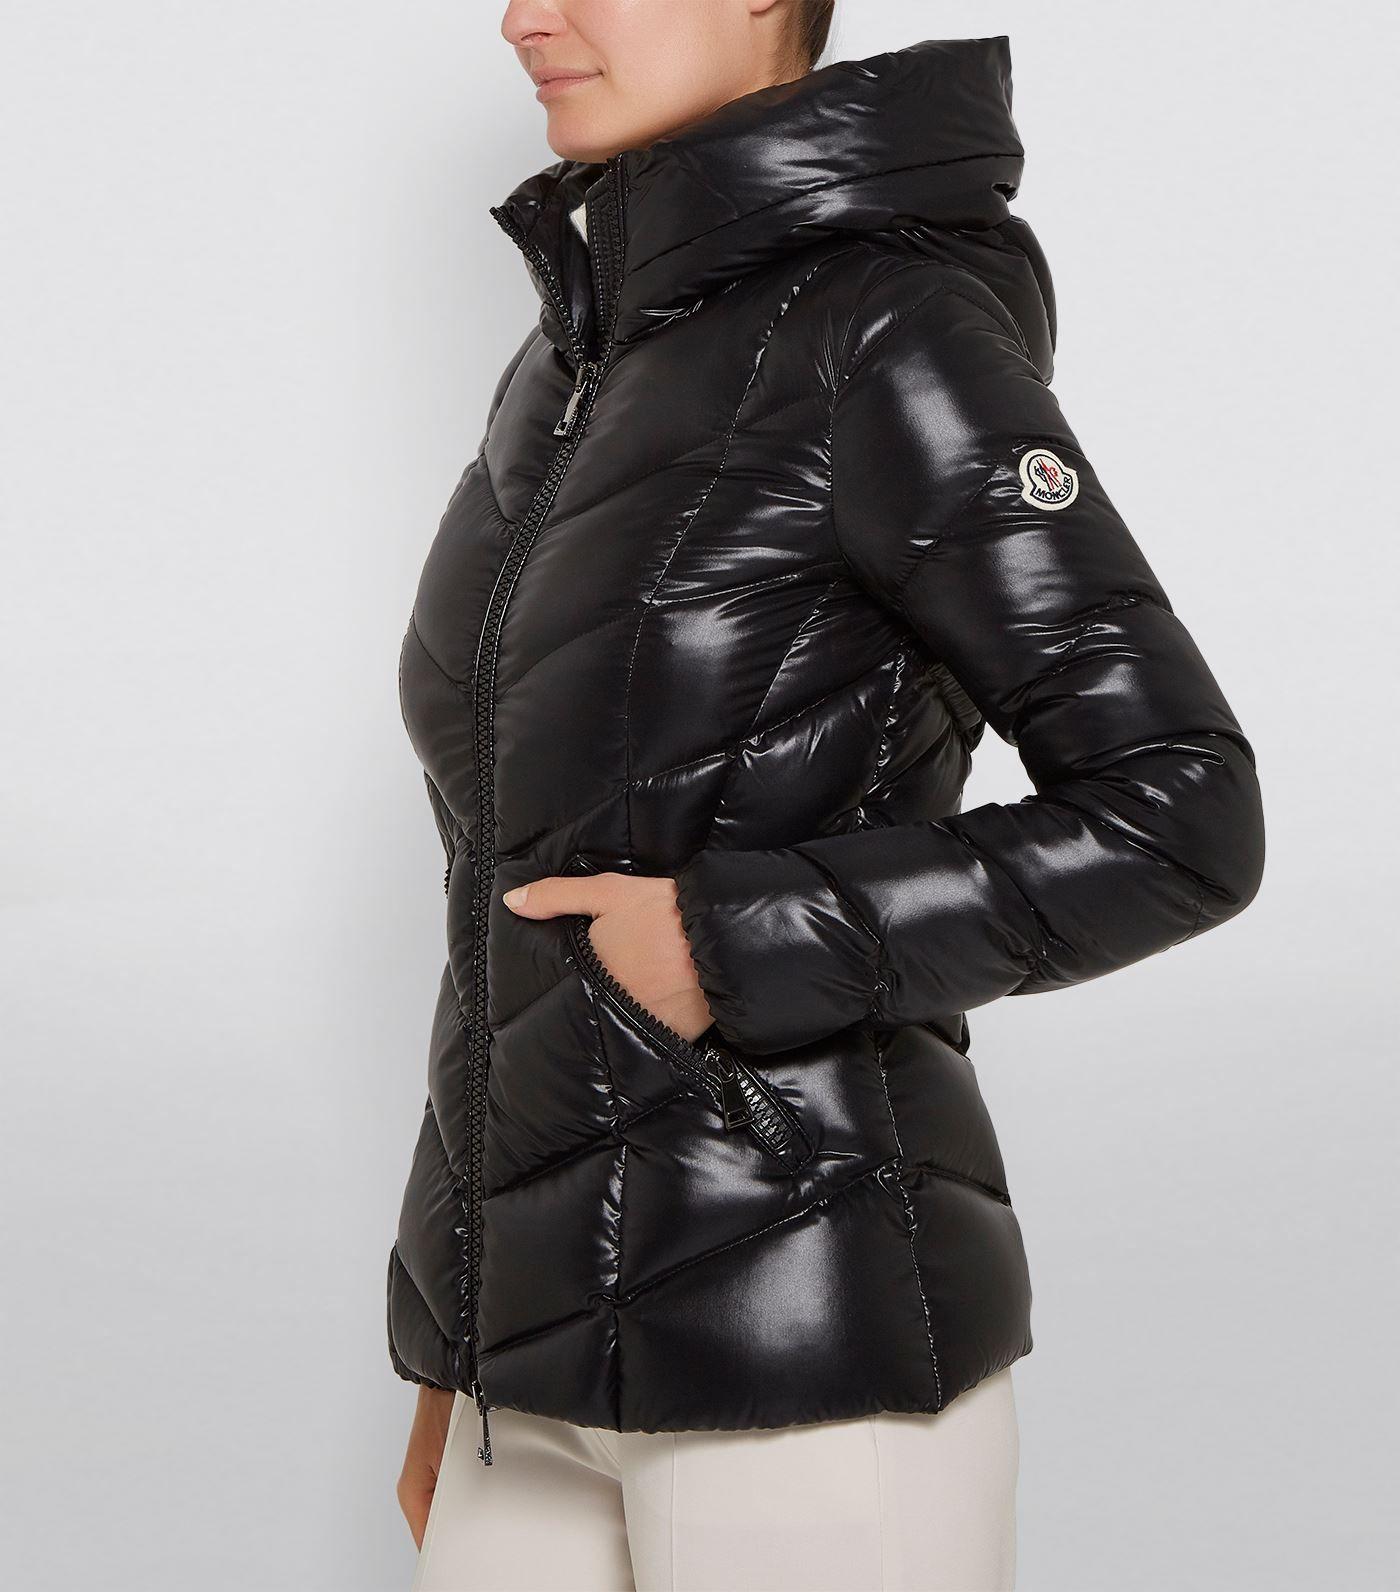 Moncler Fulig Quilted Jacket Ad Ad Fulig Moncler Jacket Quilted Moncler Moncler Women Moncler Jacket [ 1592 x 1400 Pixel ]